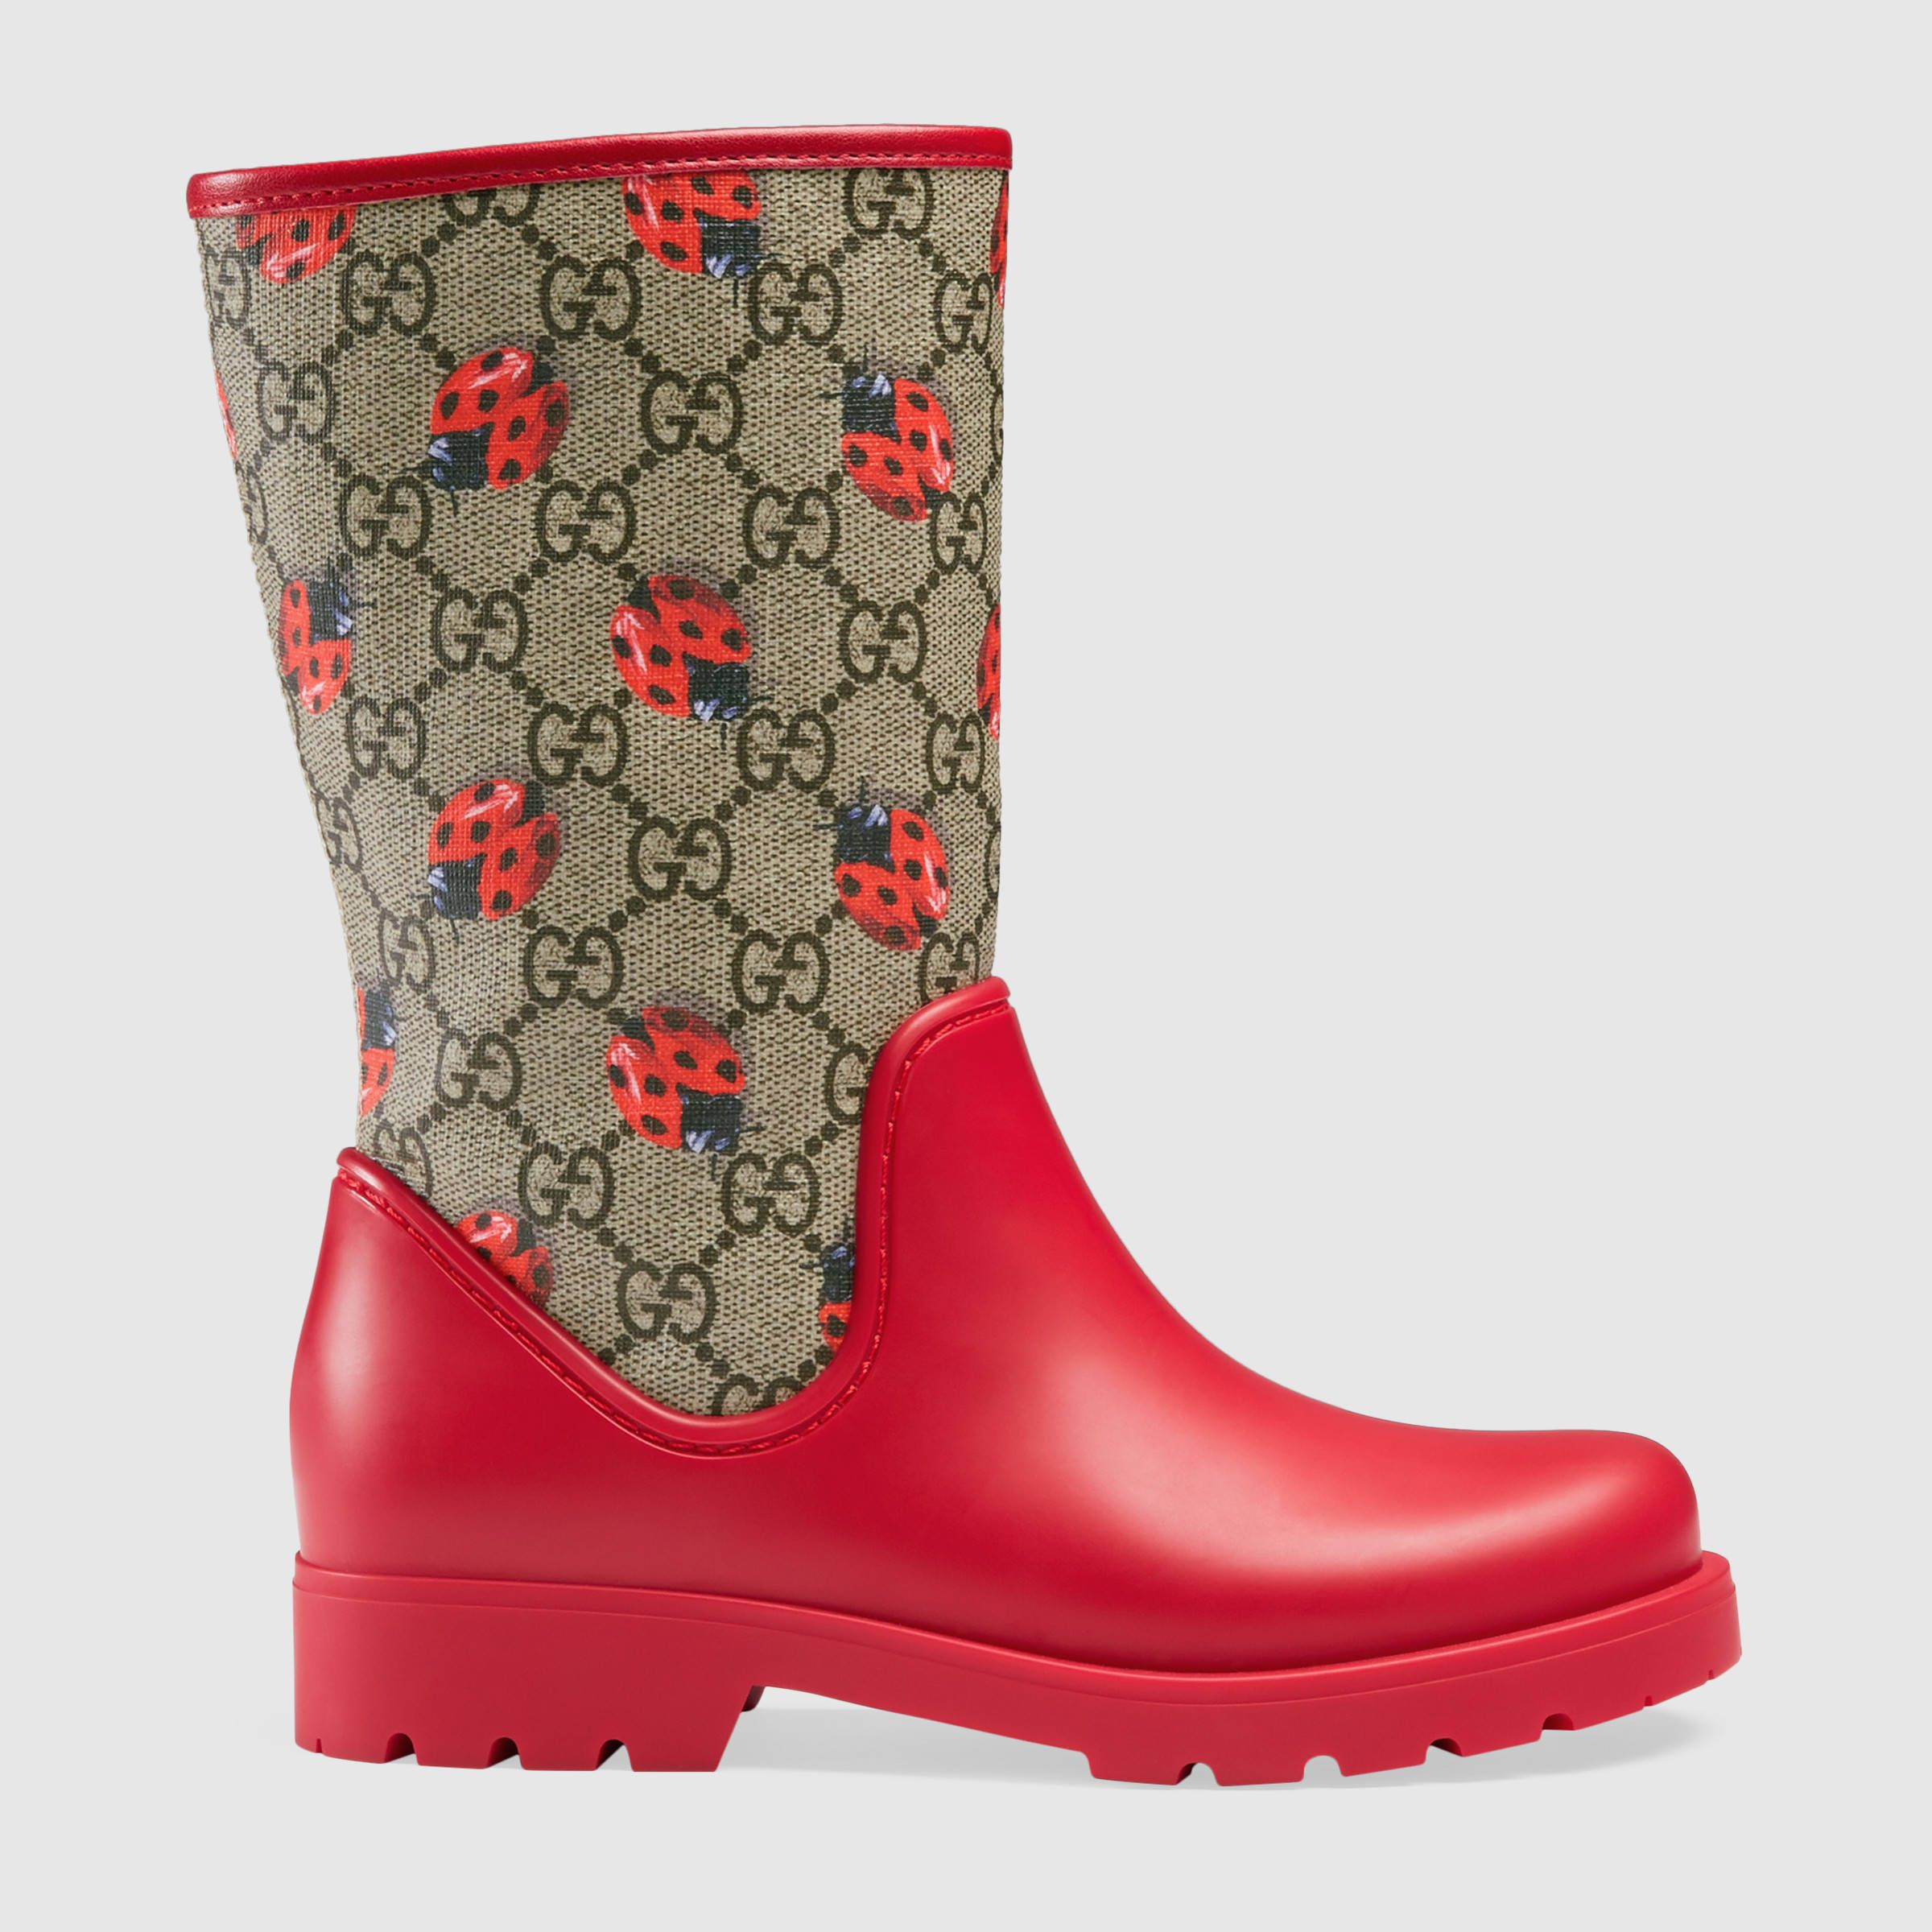 bd086b366 Gucci Children - Children's GG ladybugs rain boot | Girls Shoes ...